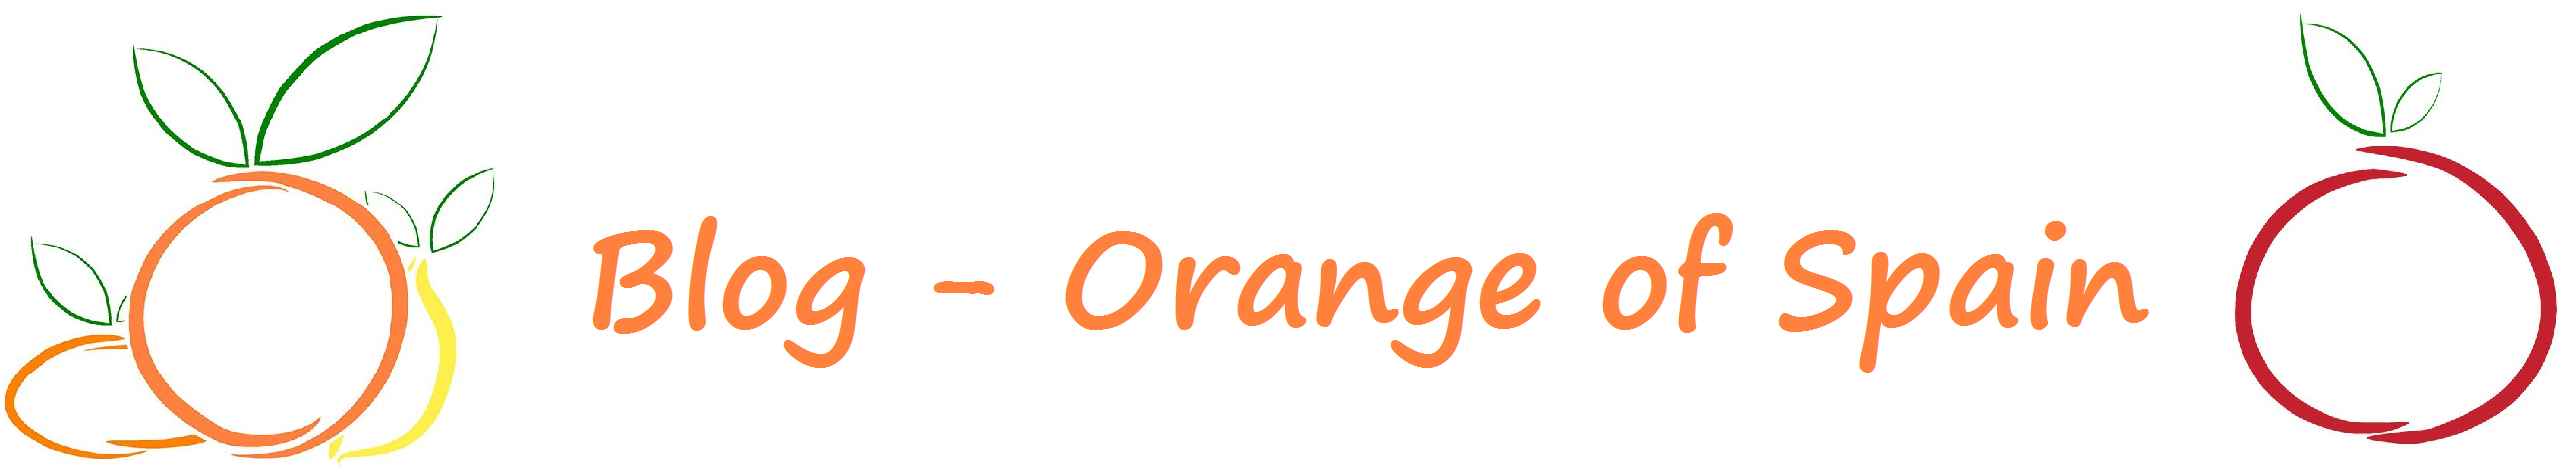 Blog – Orange of Spain